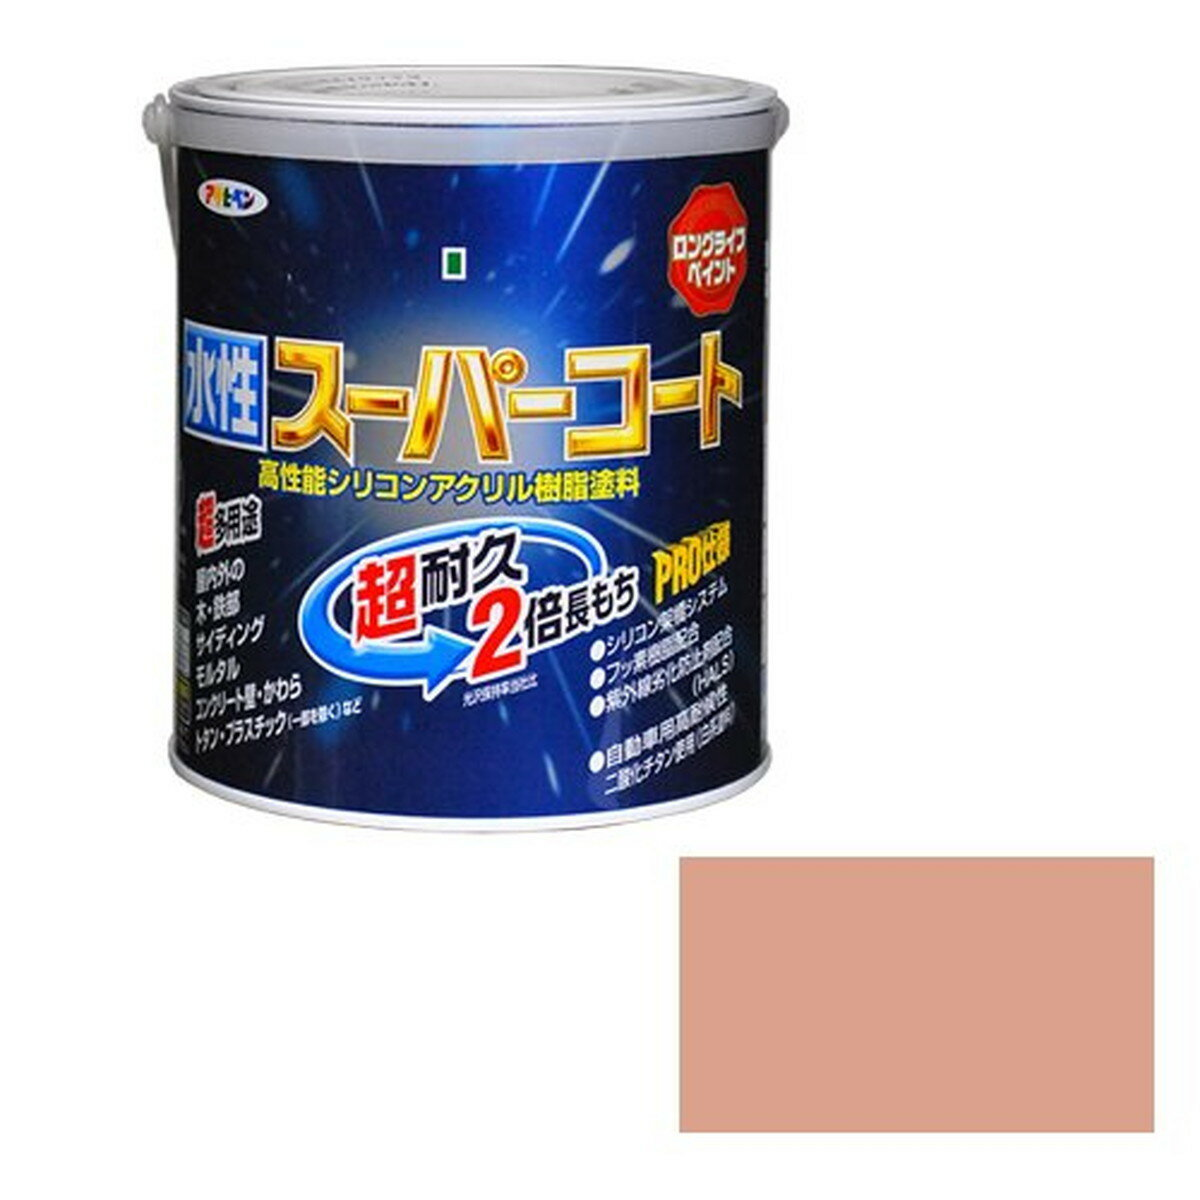 塗装用品, 塗料缶・ペンキ  1.6L